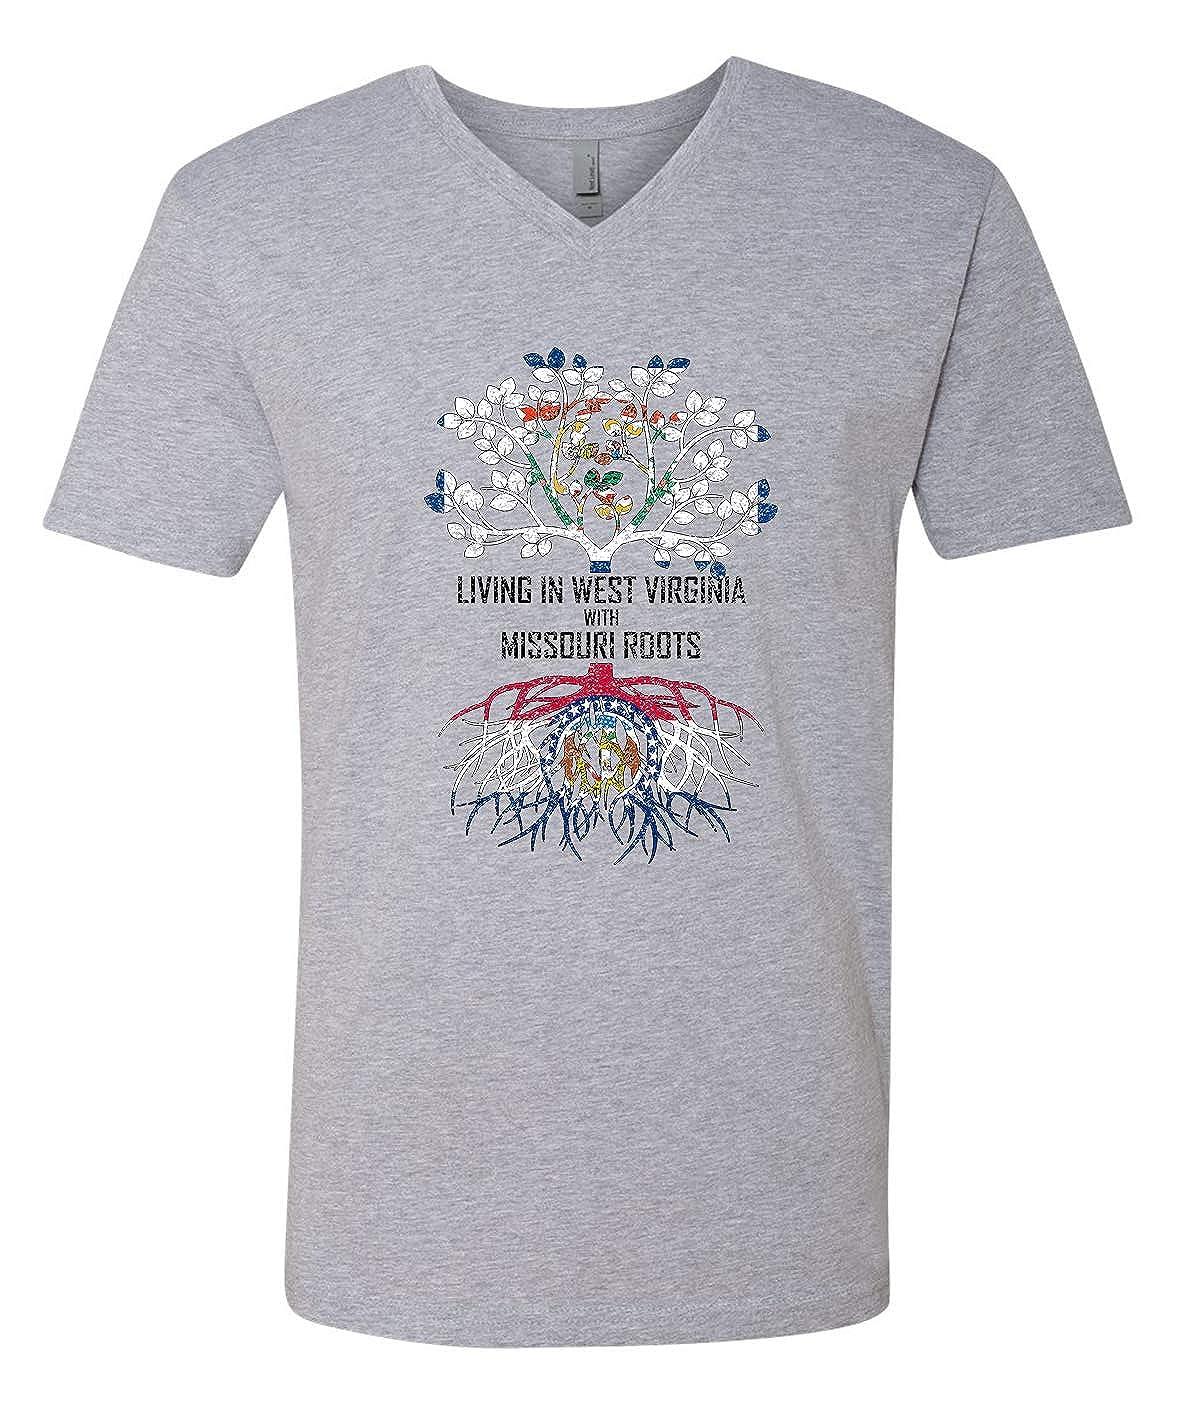 Tenacitee Mens Living in West Virginia Missouri Roots T-Shirt